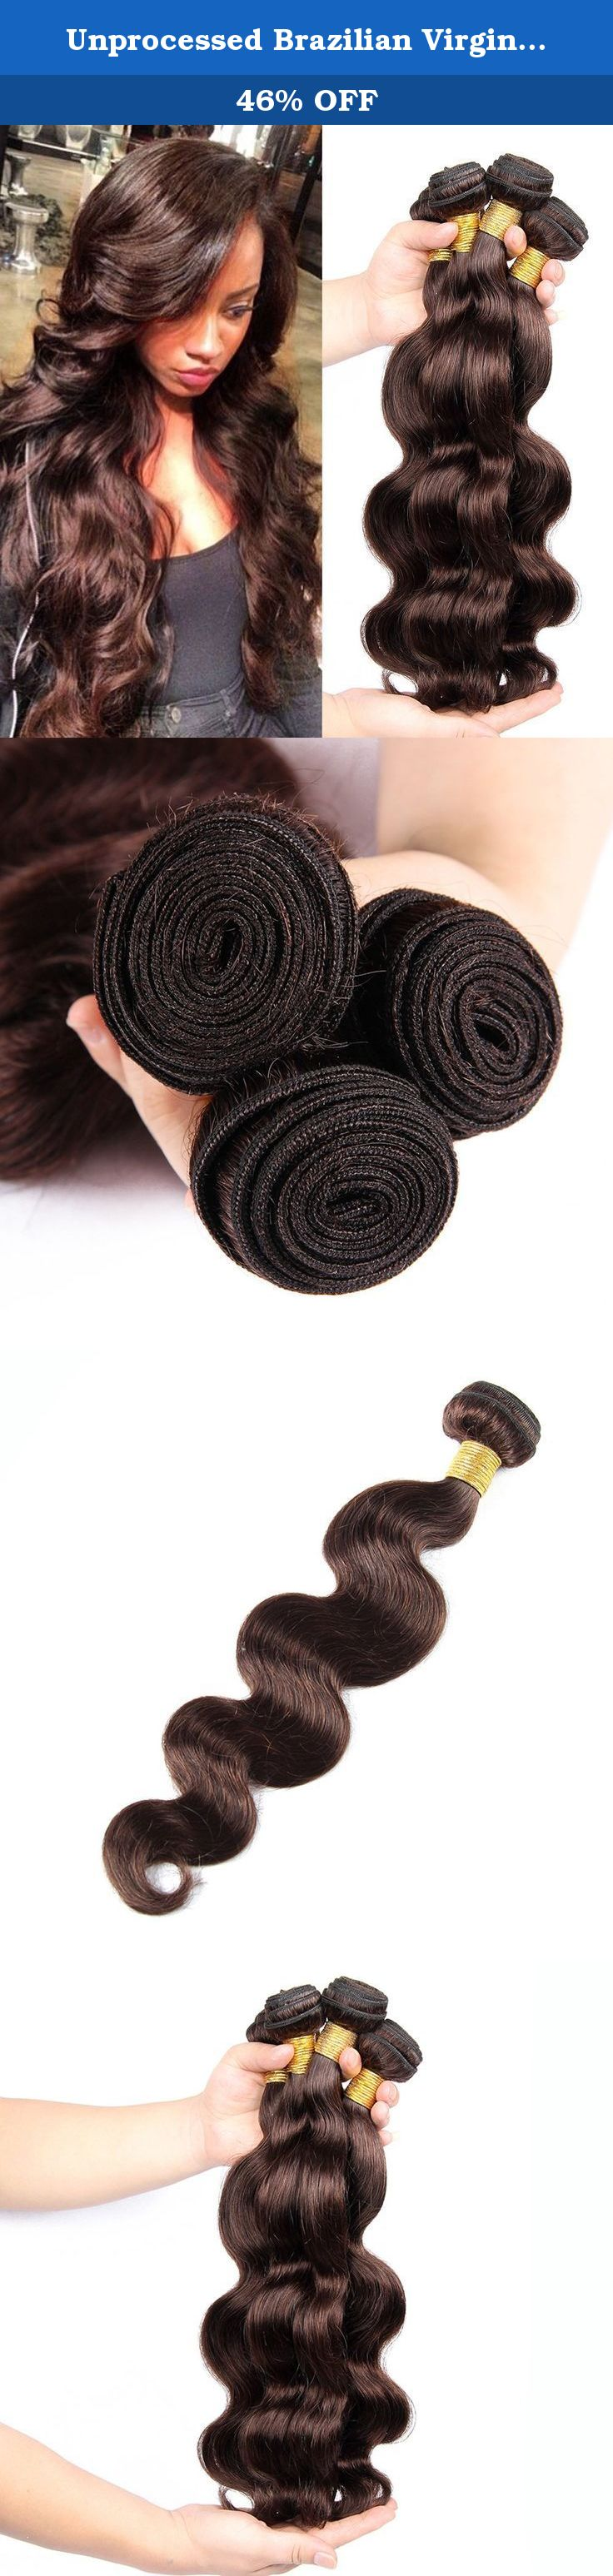 Unprocessed brazilian virgin hair body wave human hair weave pack